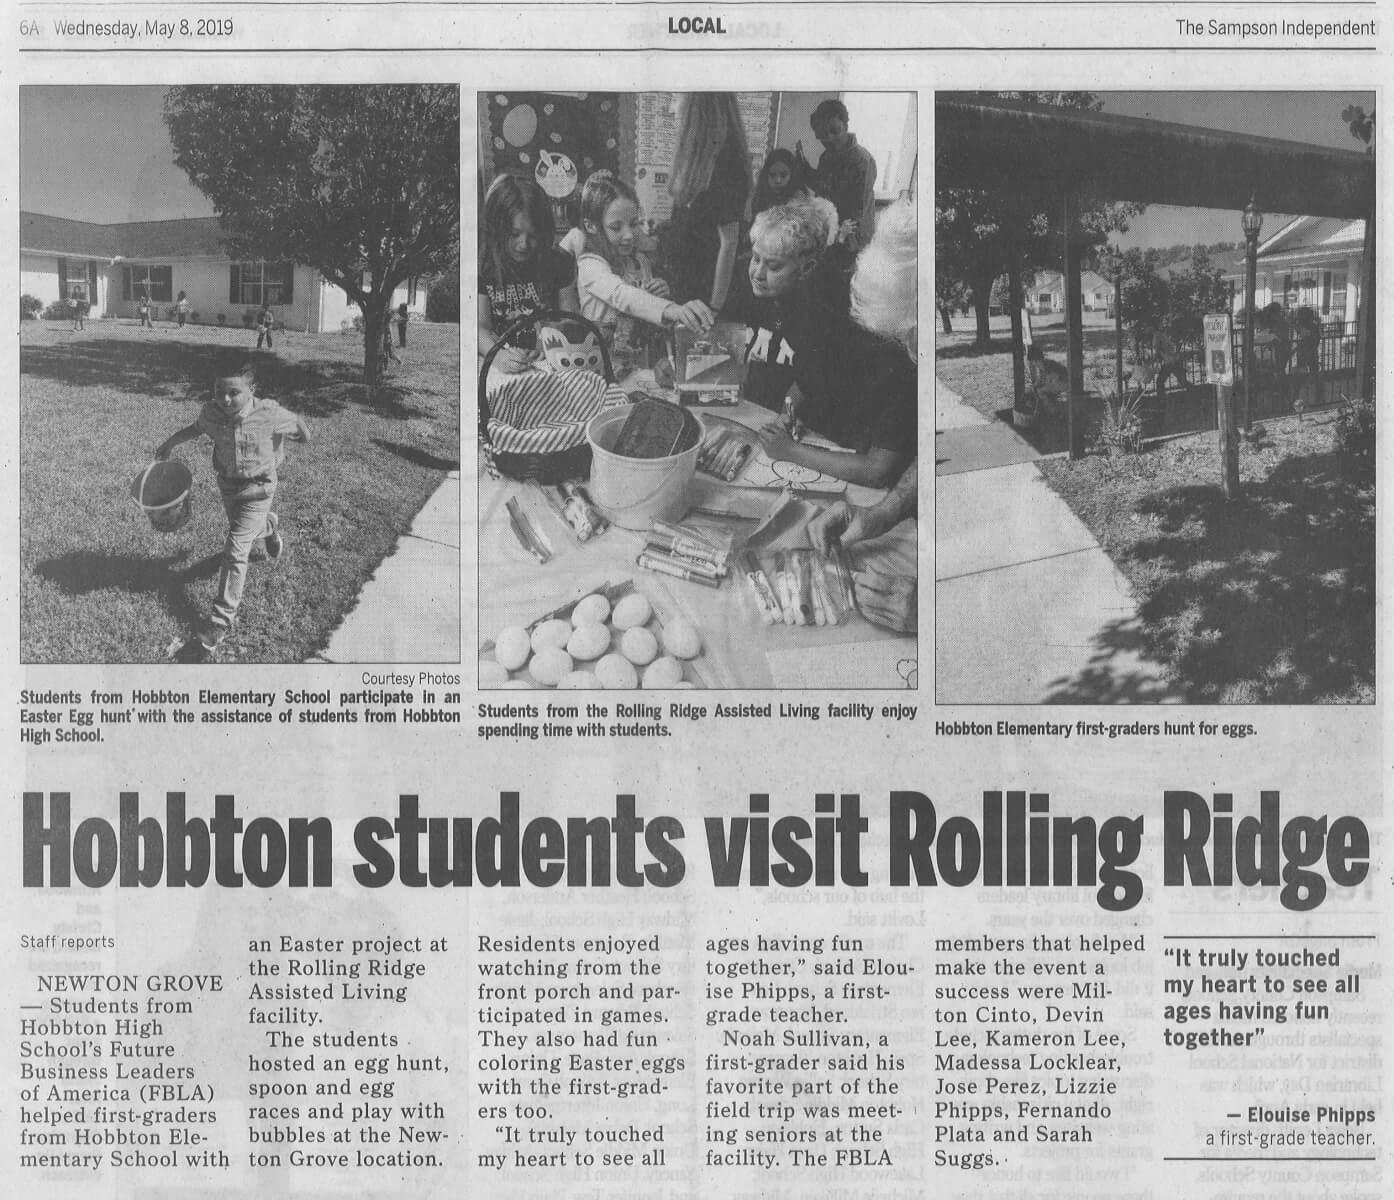 RR Student Visit, 5.8.19 Sampson Independent